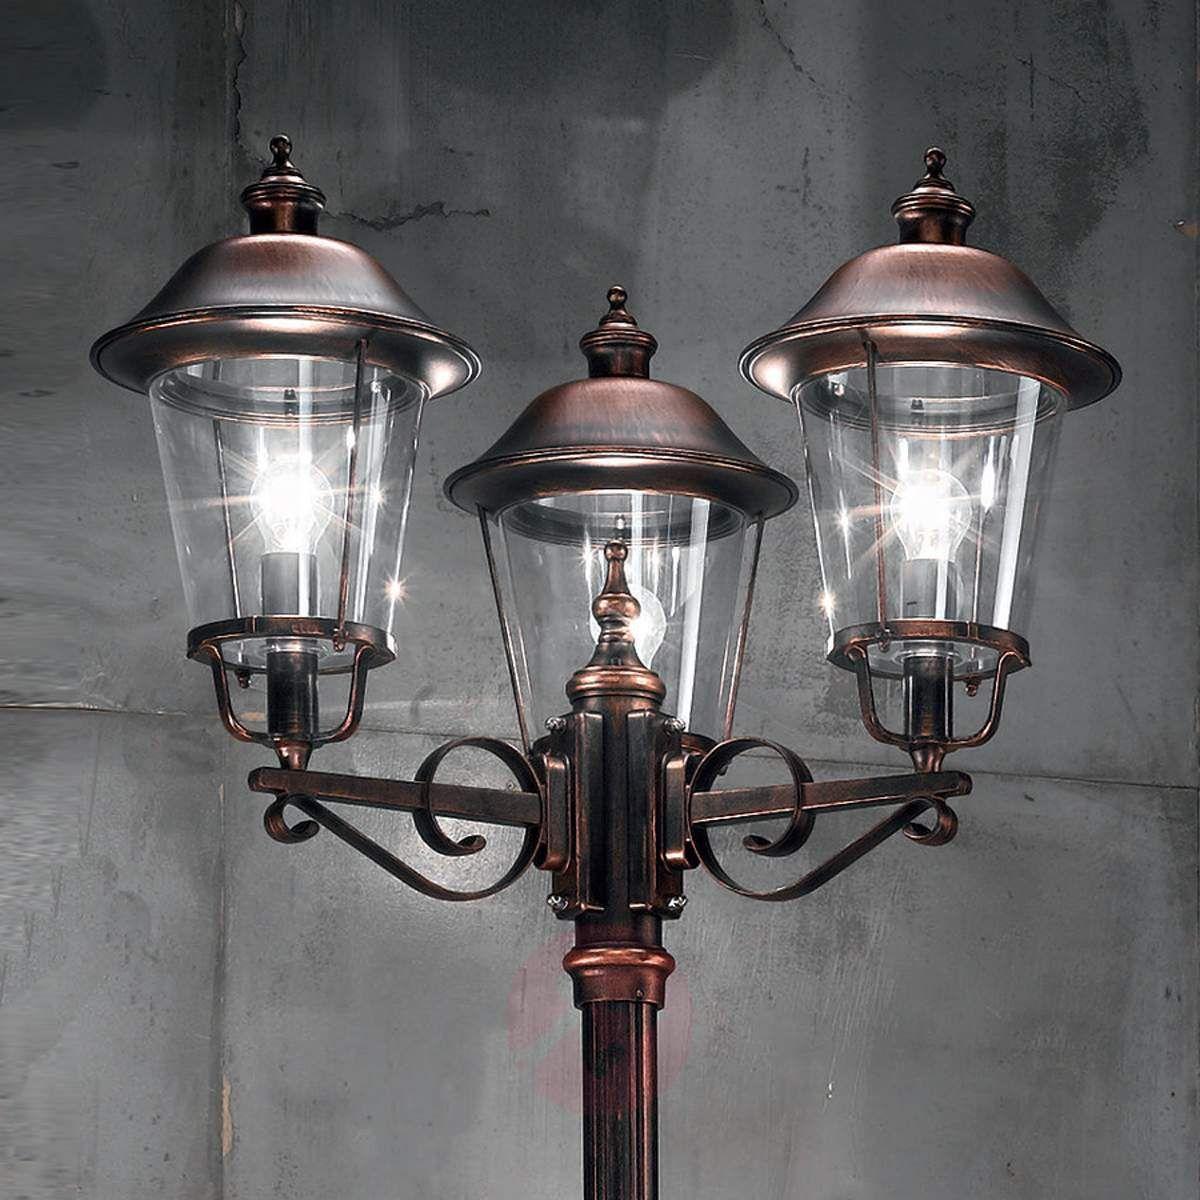 Latarnia Mariella 3 Punktowa Latarnie Ogrodowe Lampy